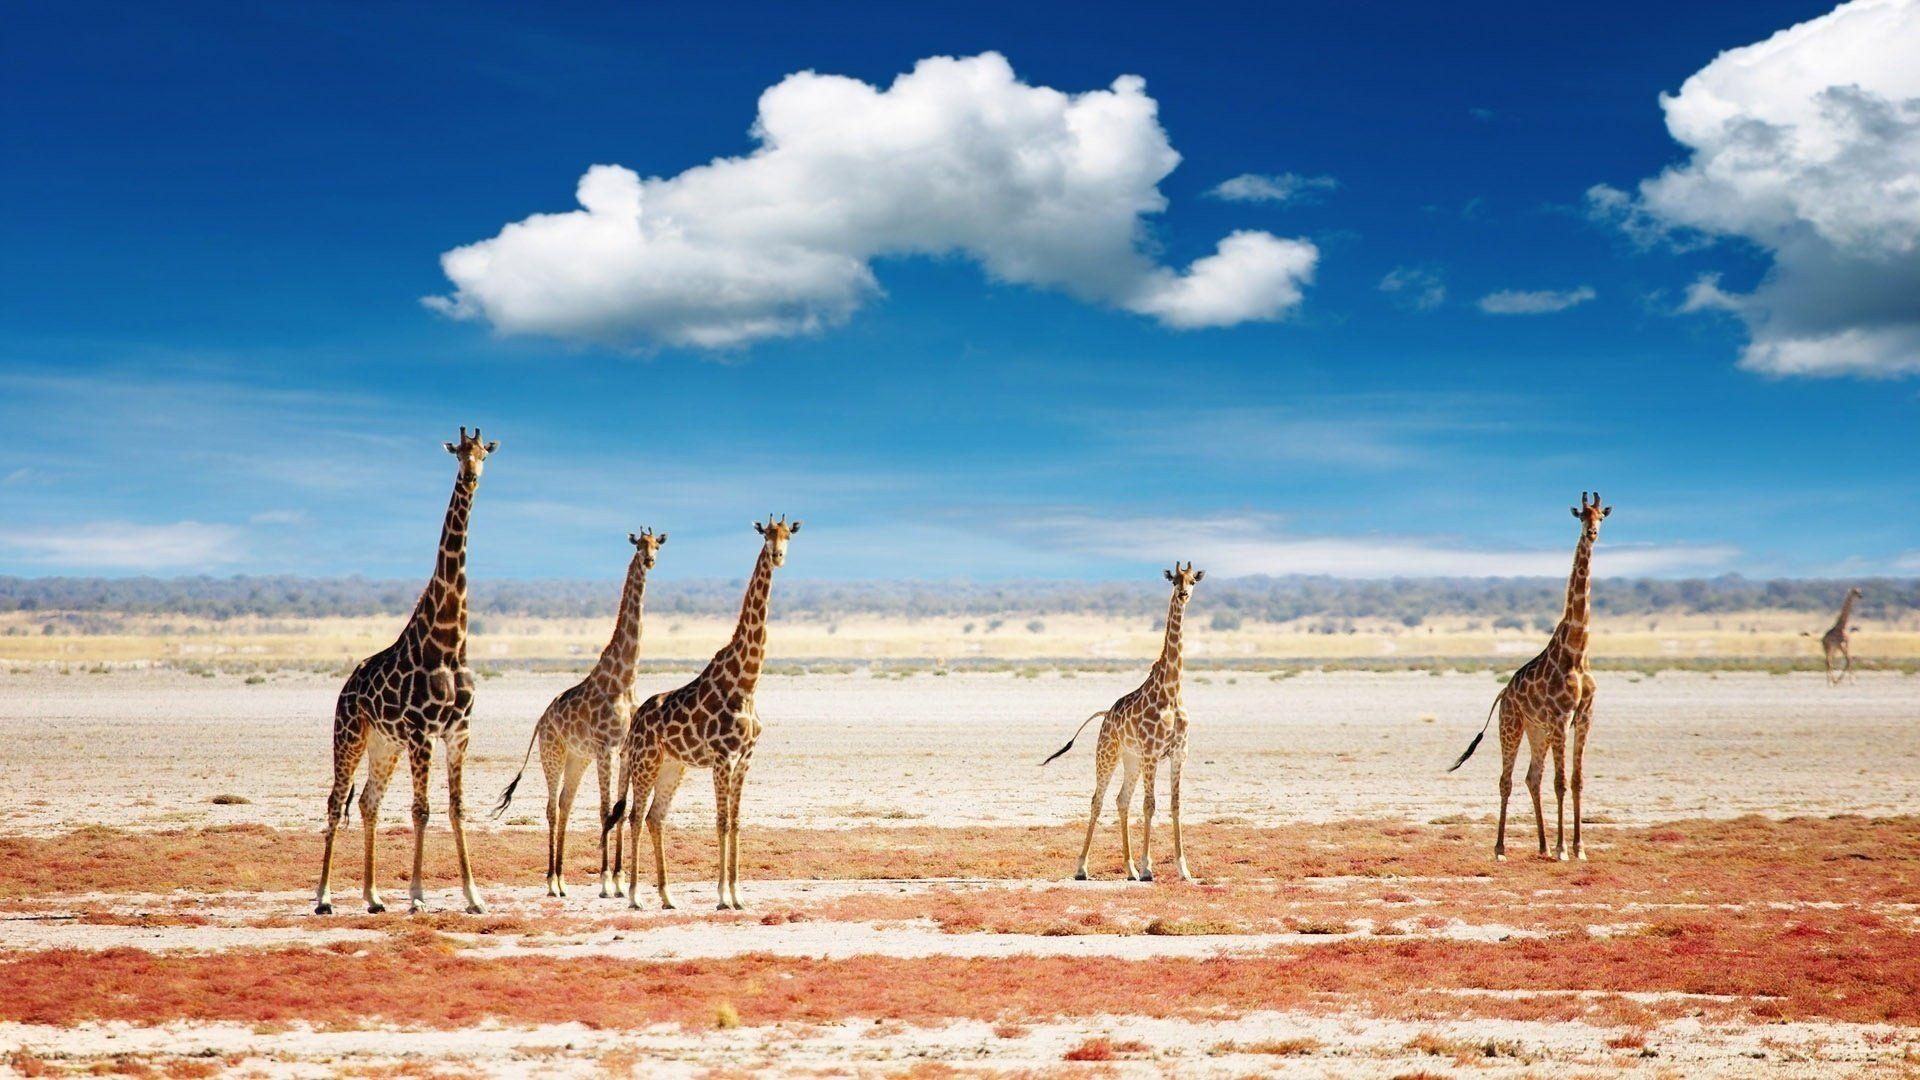 Pictures On The Desktop Giraffes